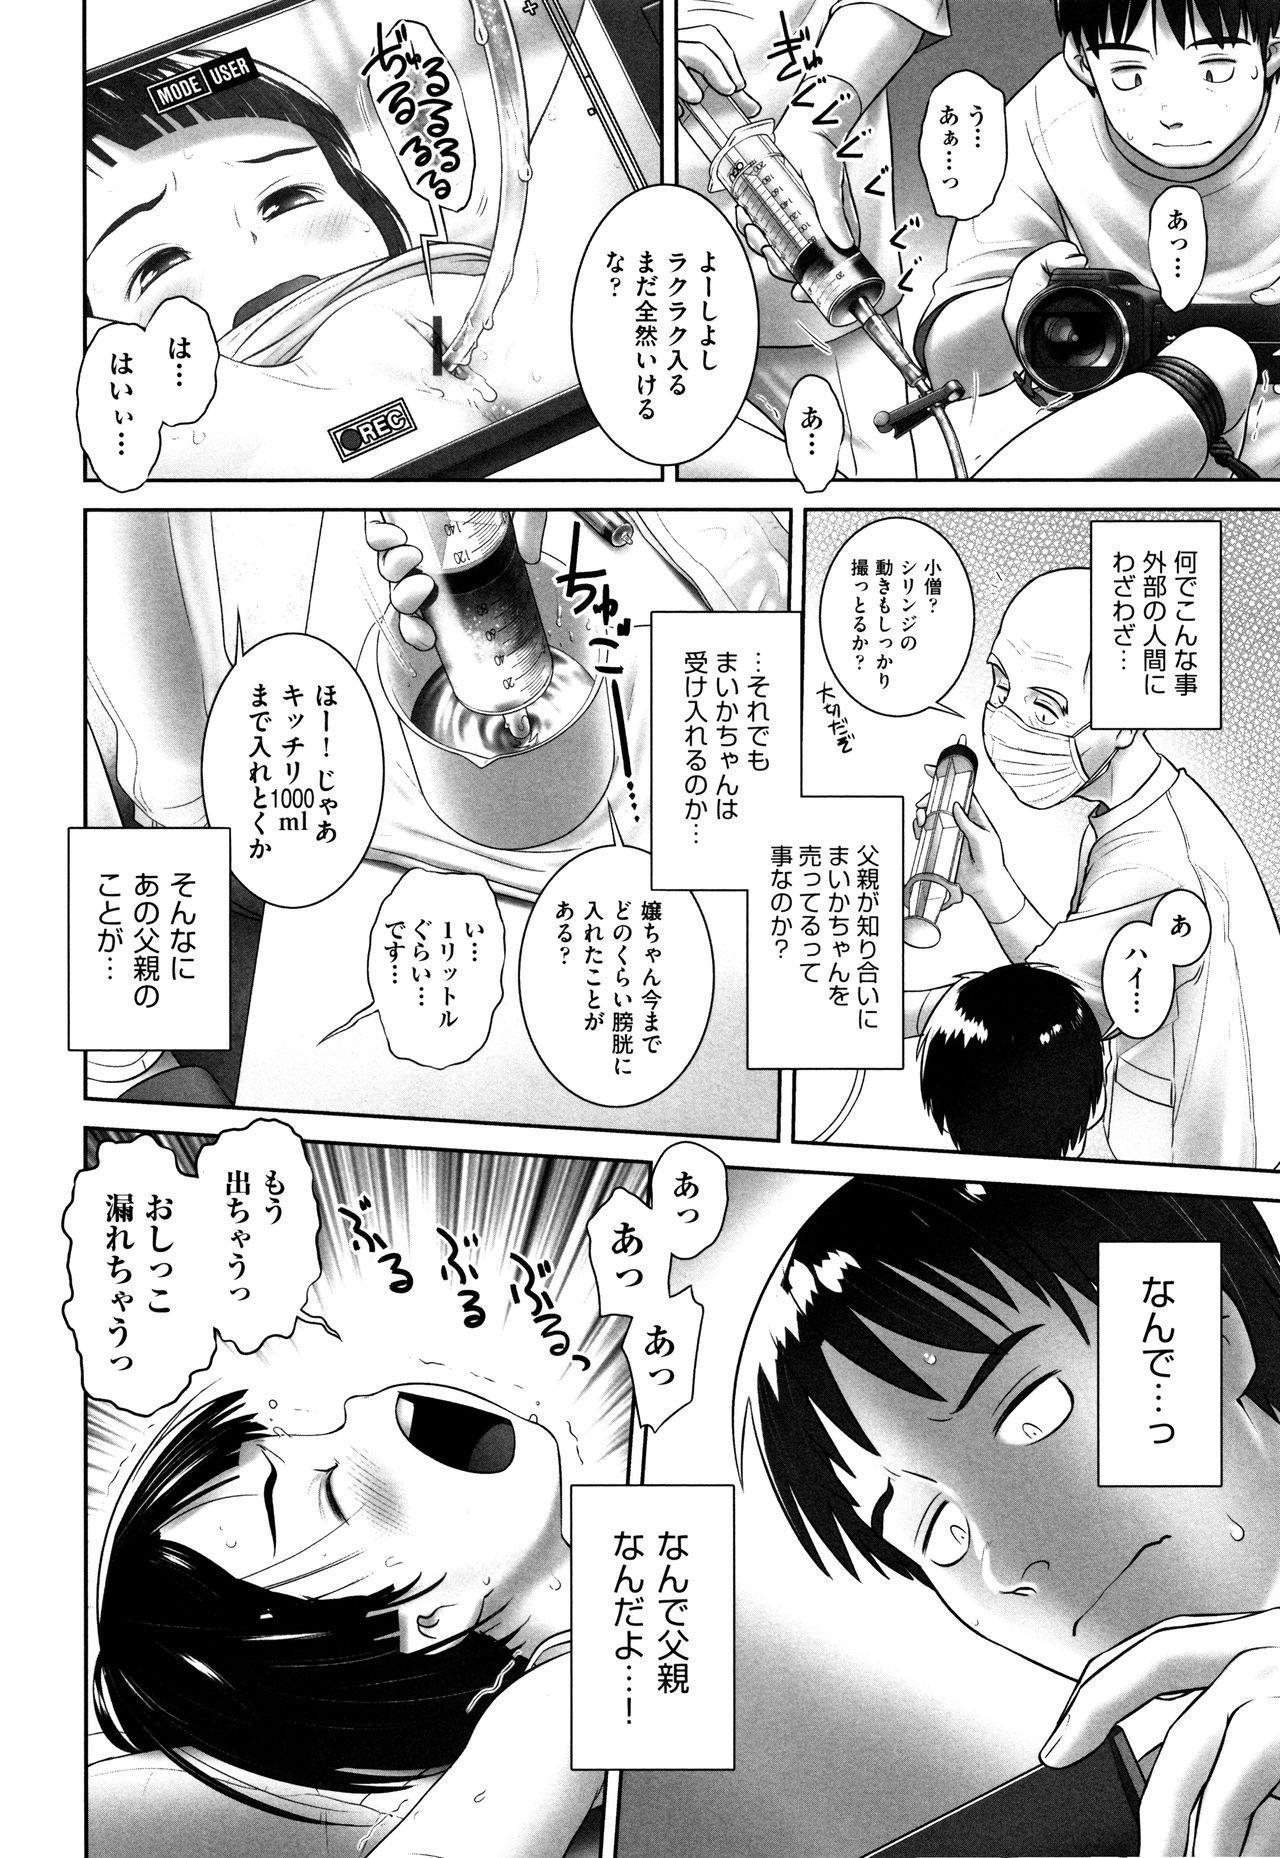 Shoujo Kumikyoku 7 128